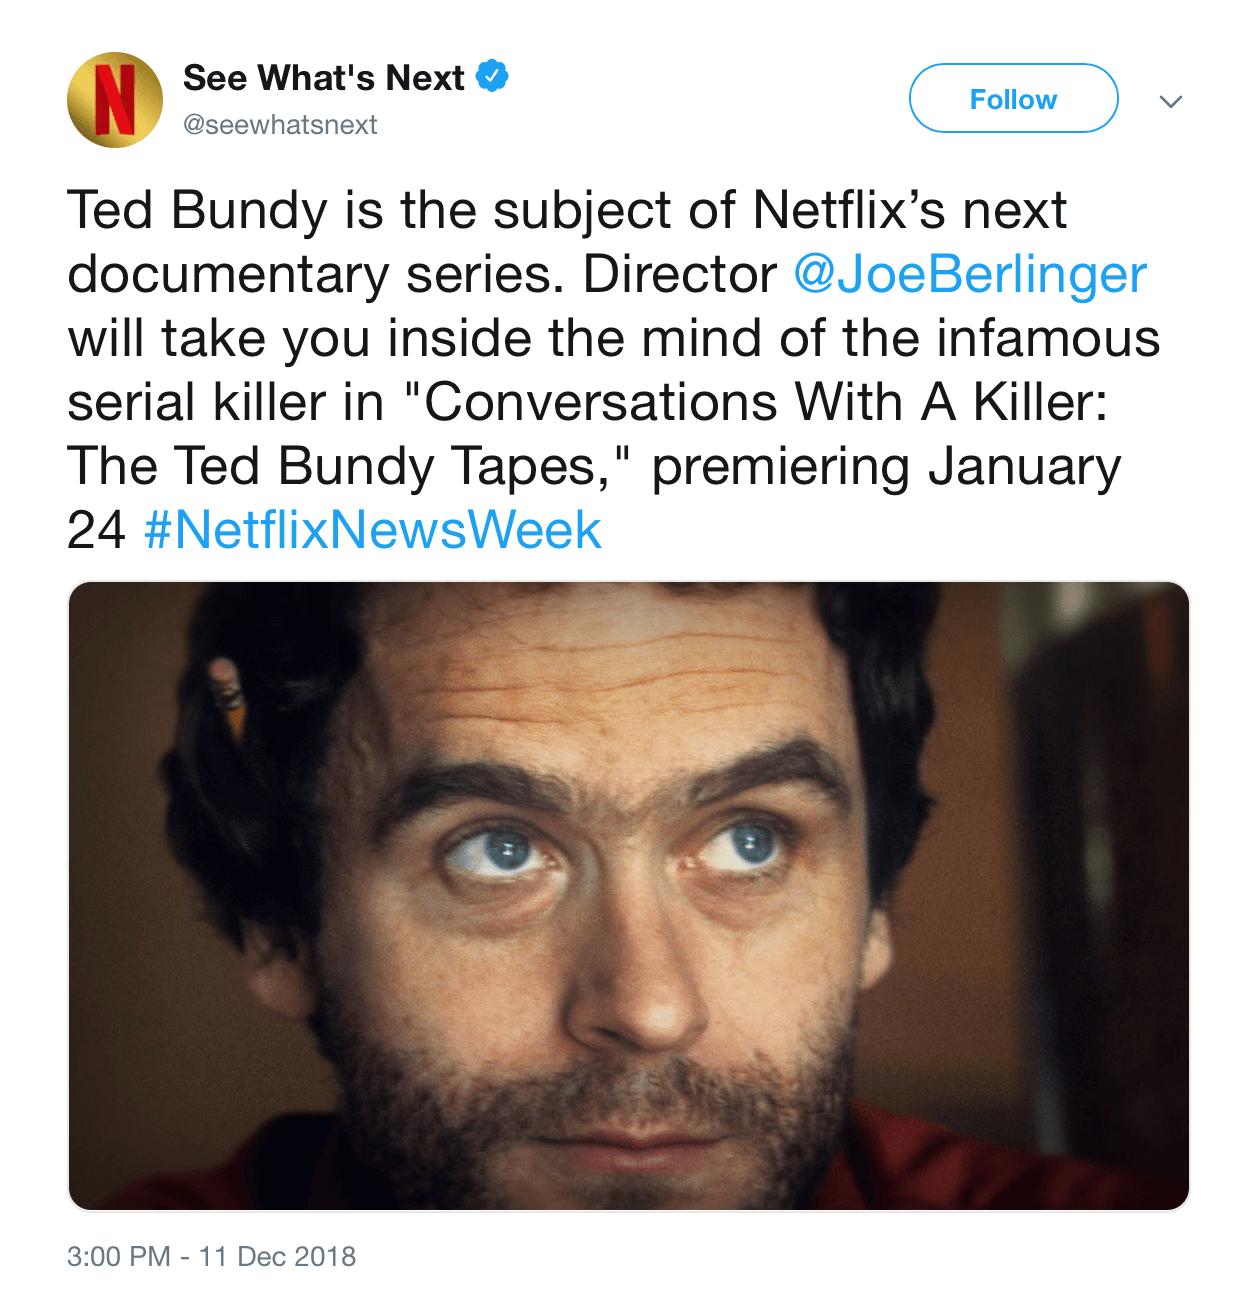 netflix closes in on a serial killer tvweek rh tvweek com